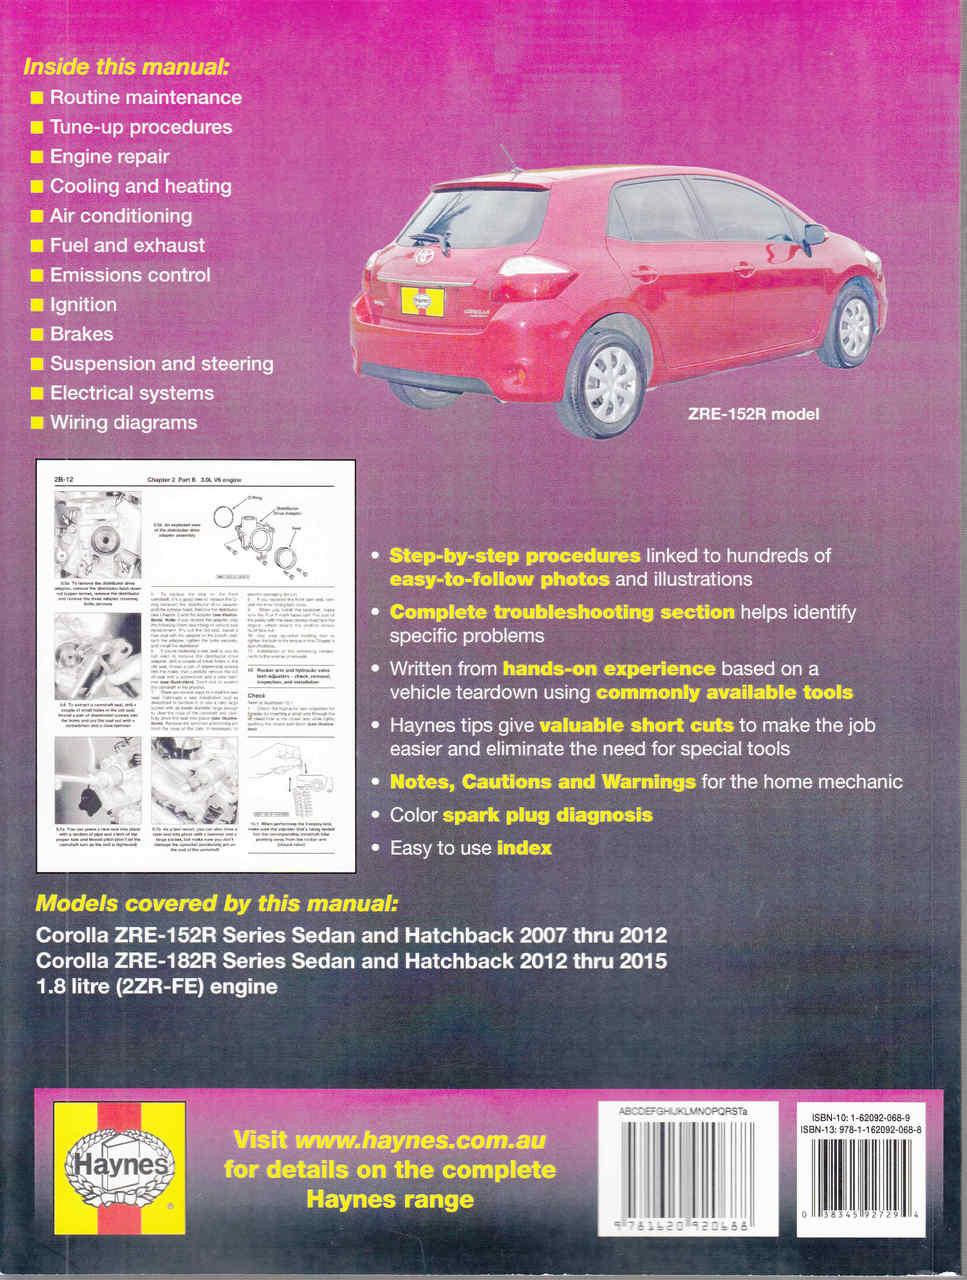 toyota corolla 1 8 litre engine zre 152r zre 182r 2007 2015 workshop  [ 967 x 1280 Pixel ]